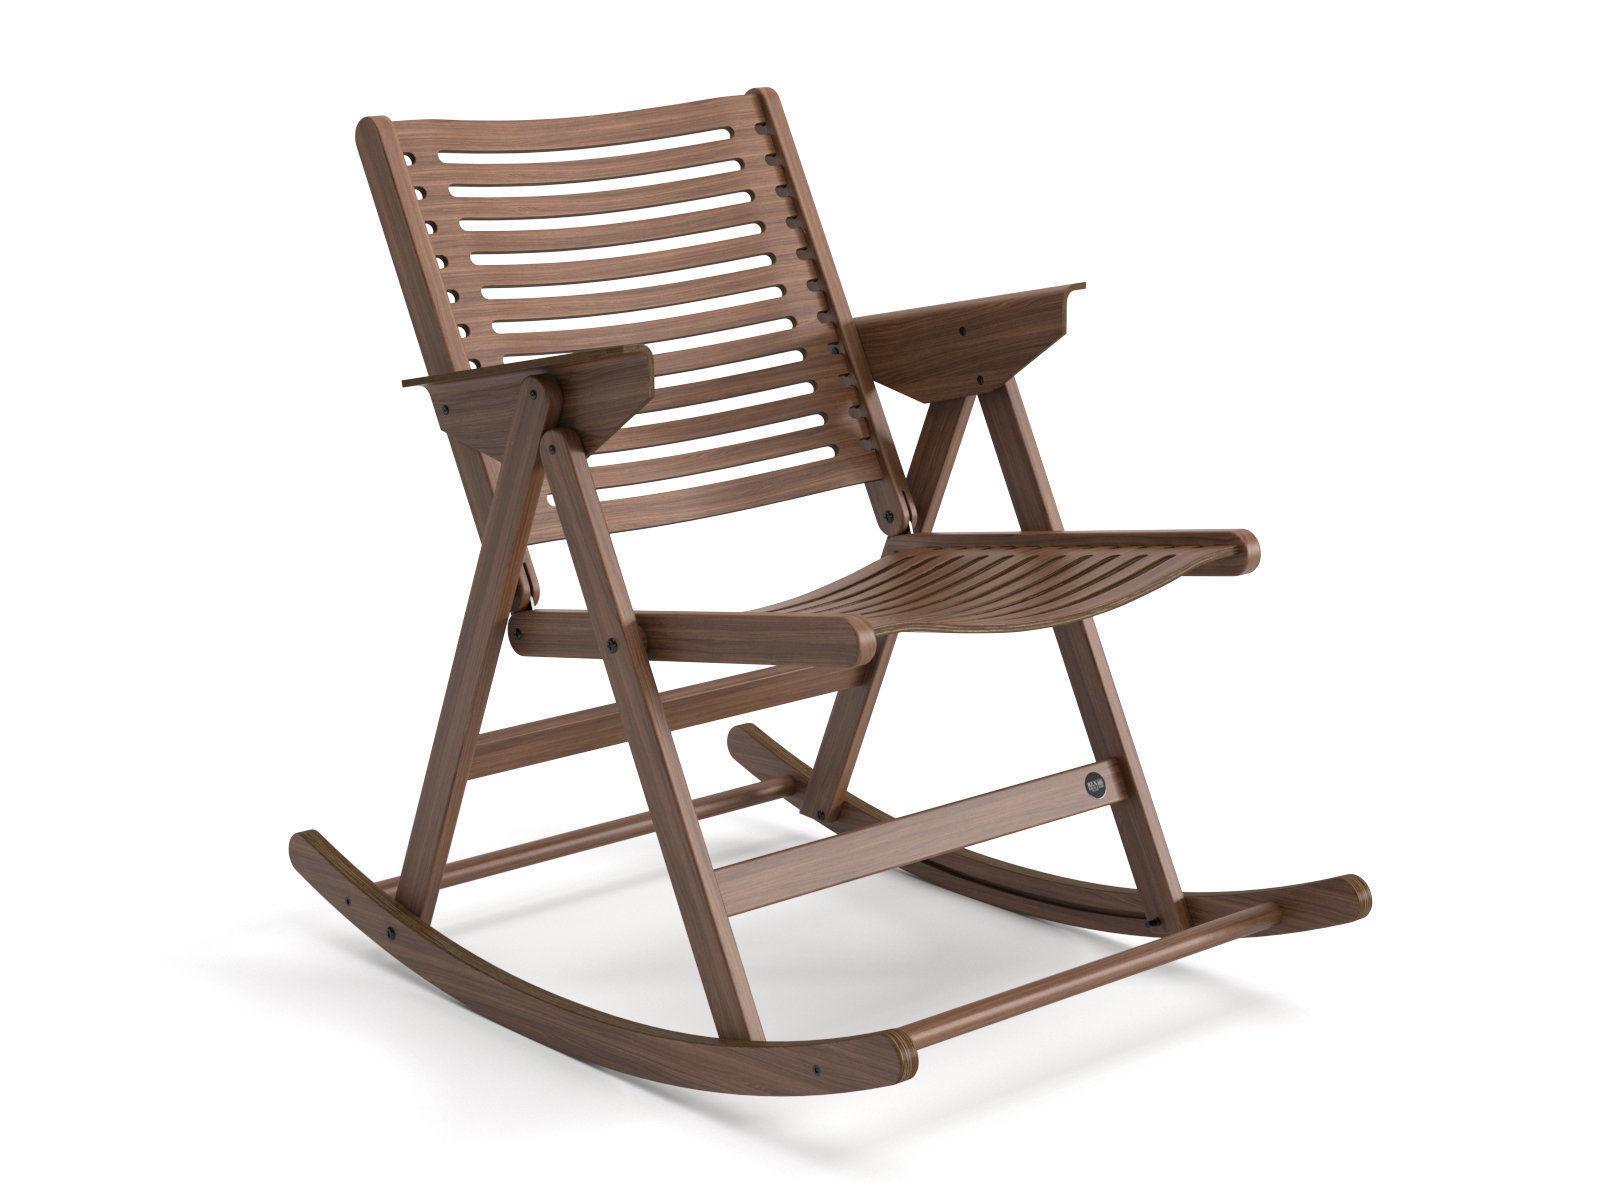 Fantastic Rex Rocking Chair 3D Model Andrewgaddart Wooden Chair Designs For Living Room Andrewgaddartcom